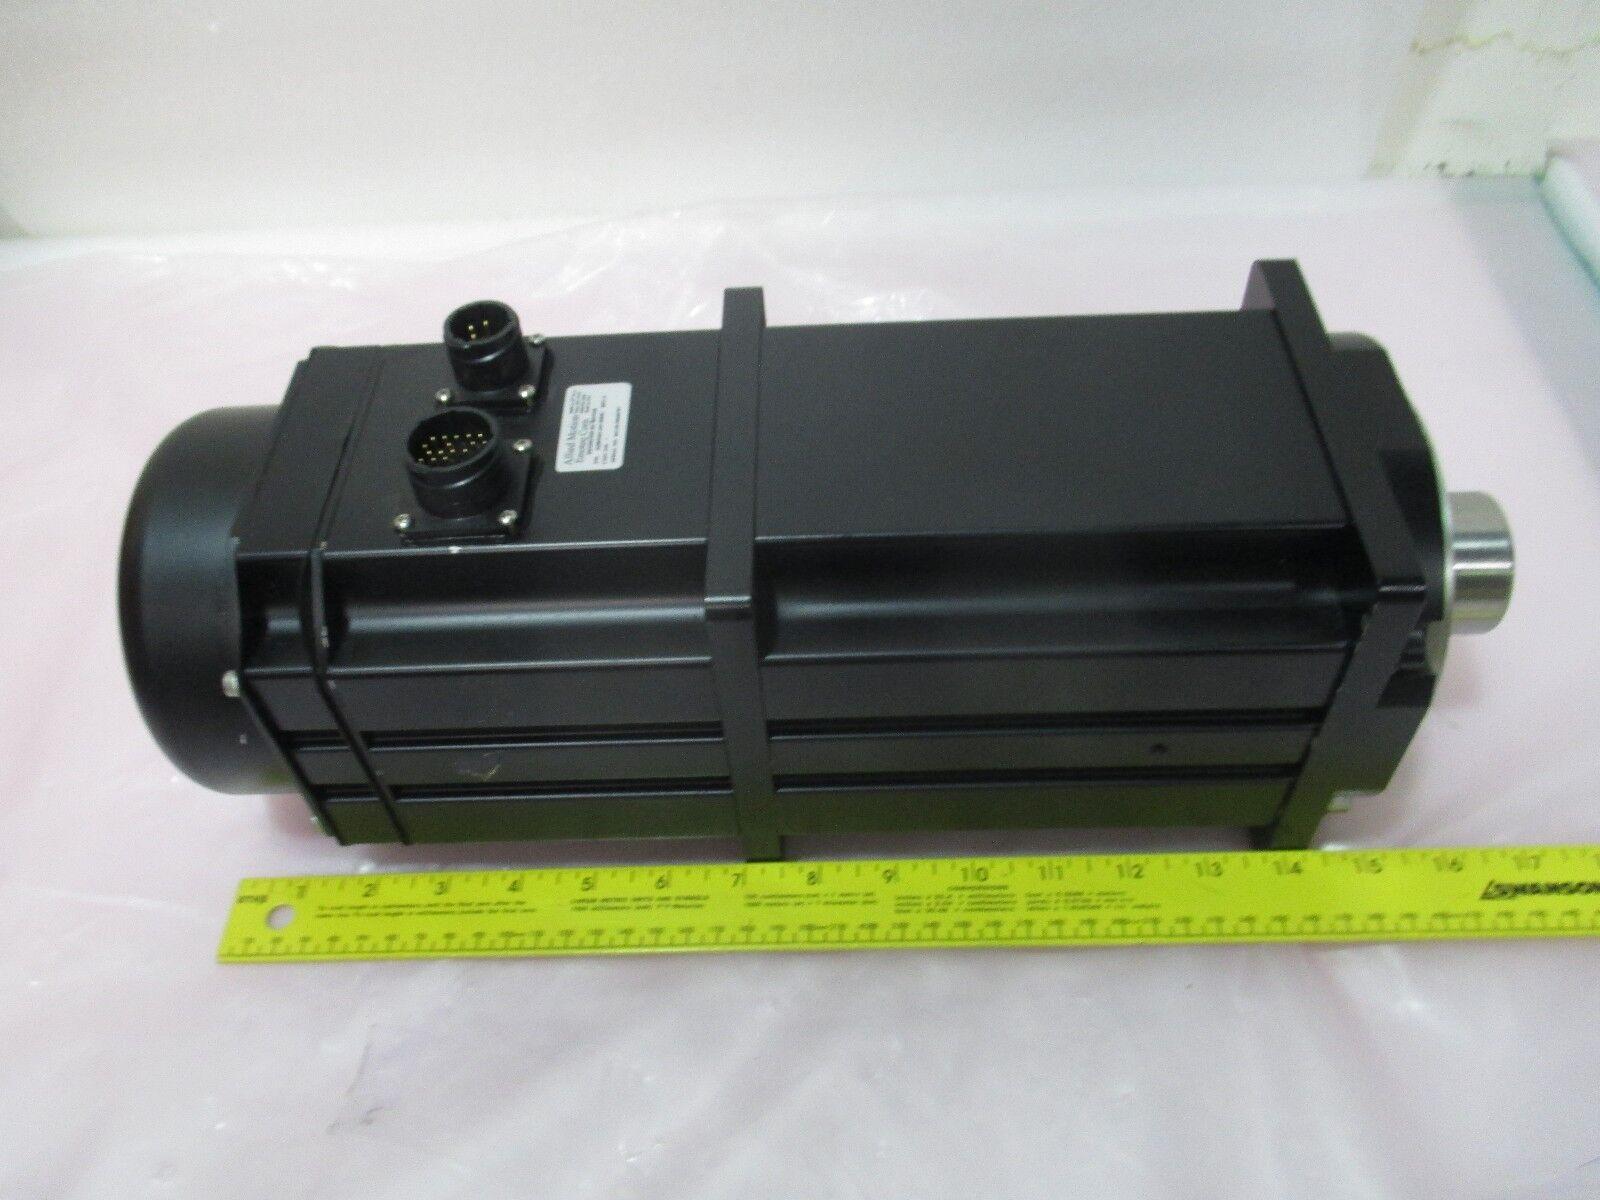 Allied Motion DC Brushless Motor SQB05603-A01-HBRC, Servo, 422250